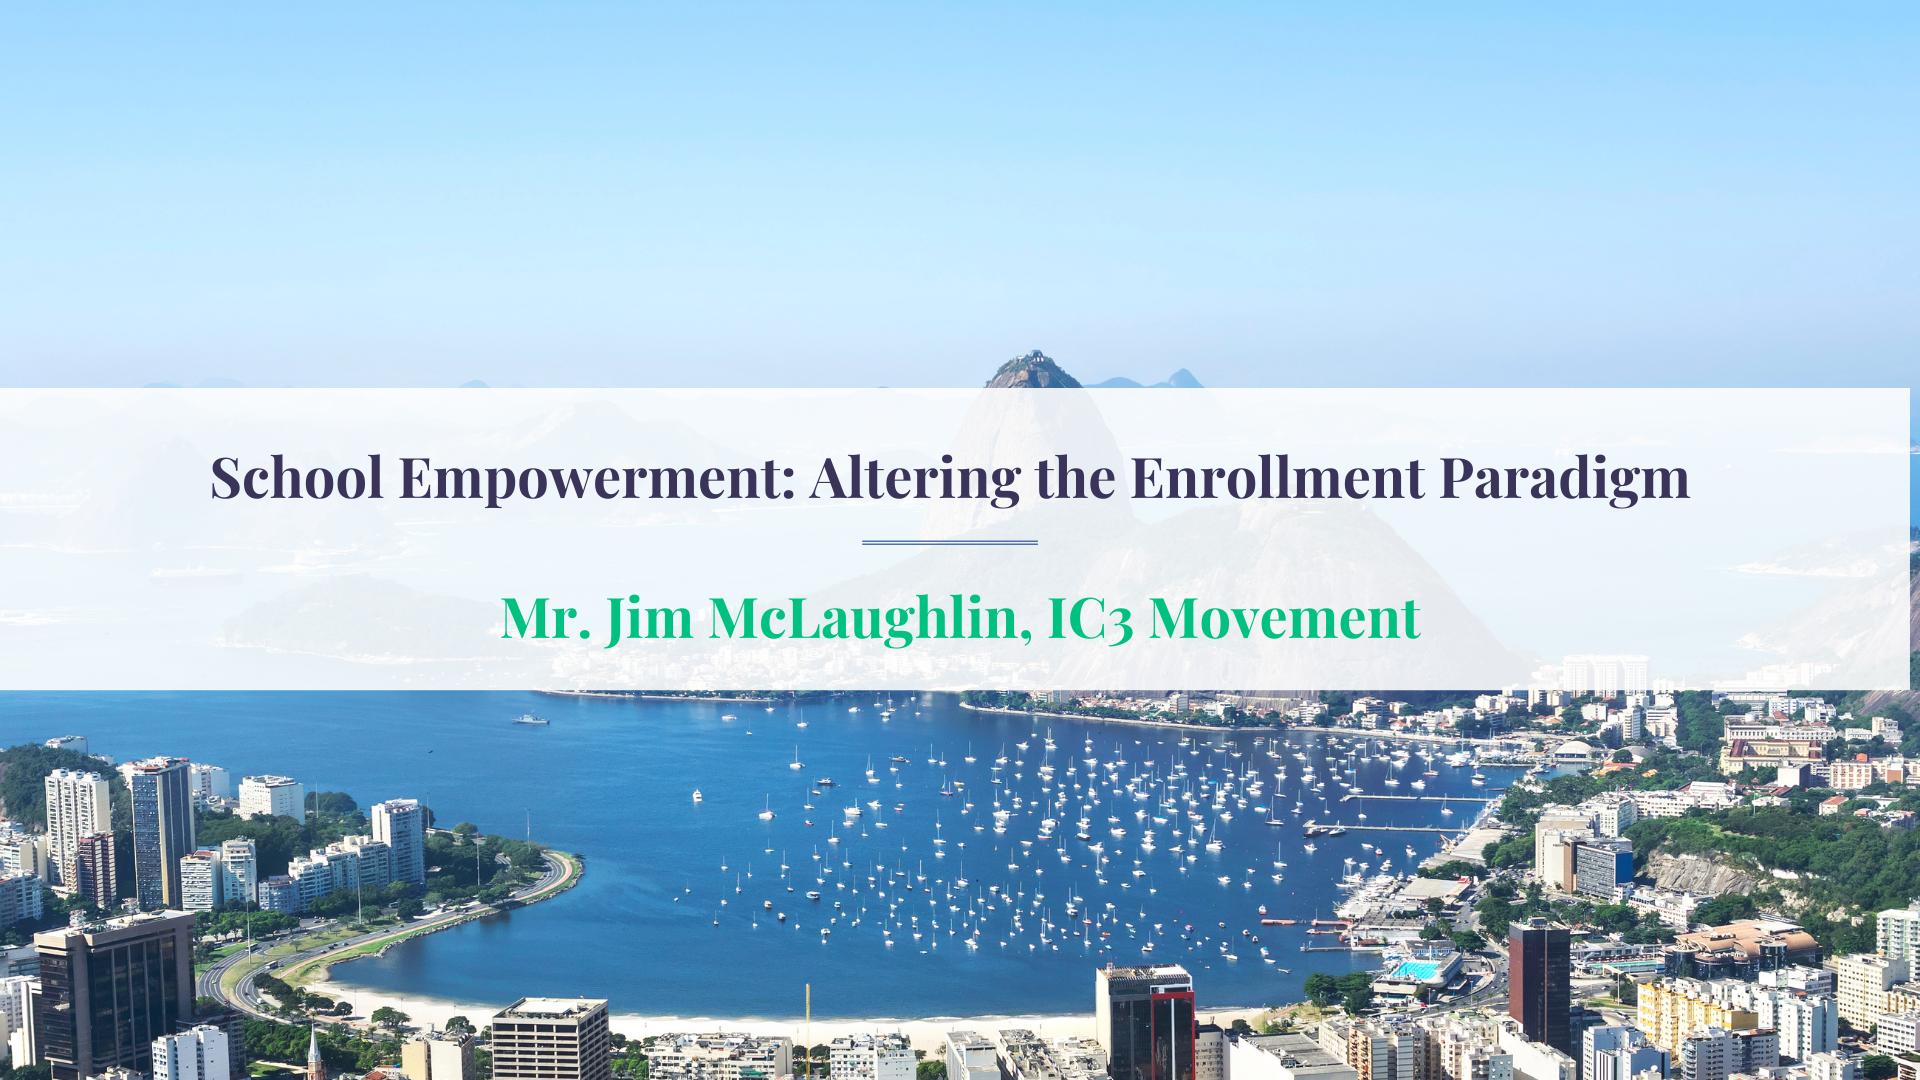 ECIE School Empowerment Altering the Enrollment Paradigm